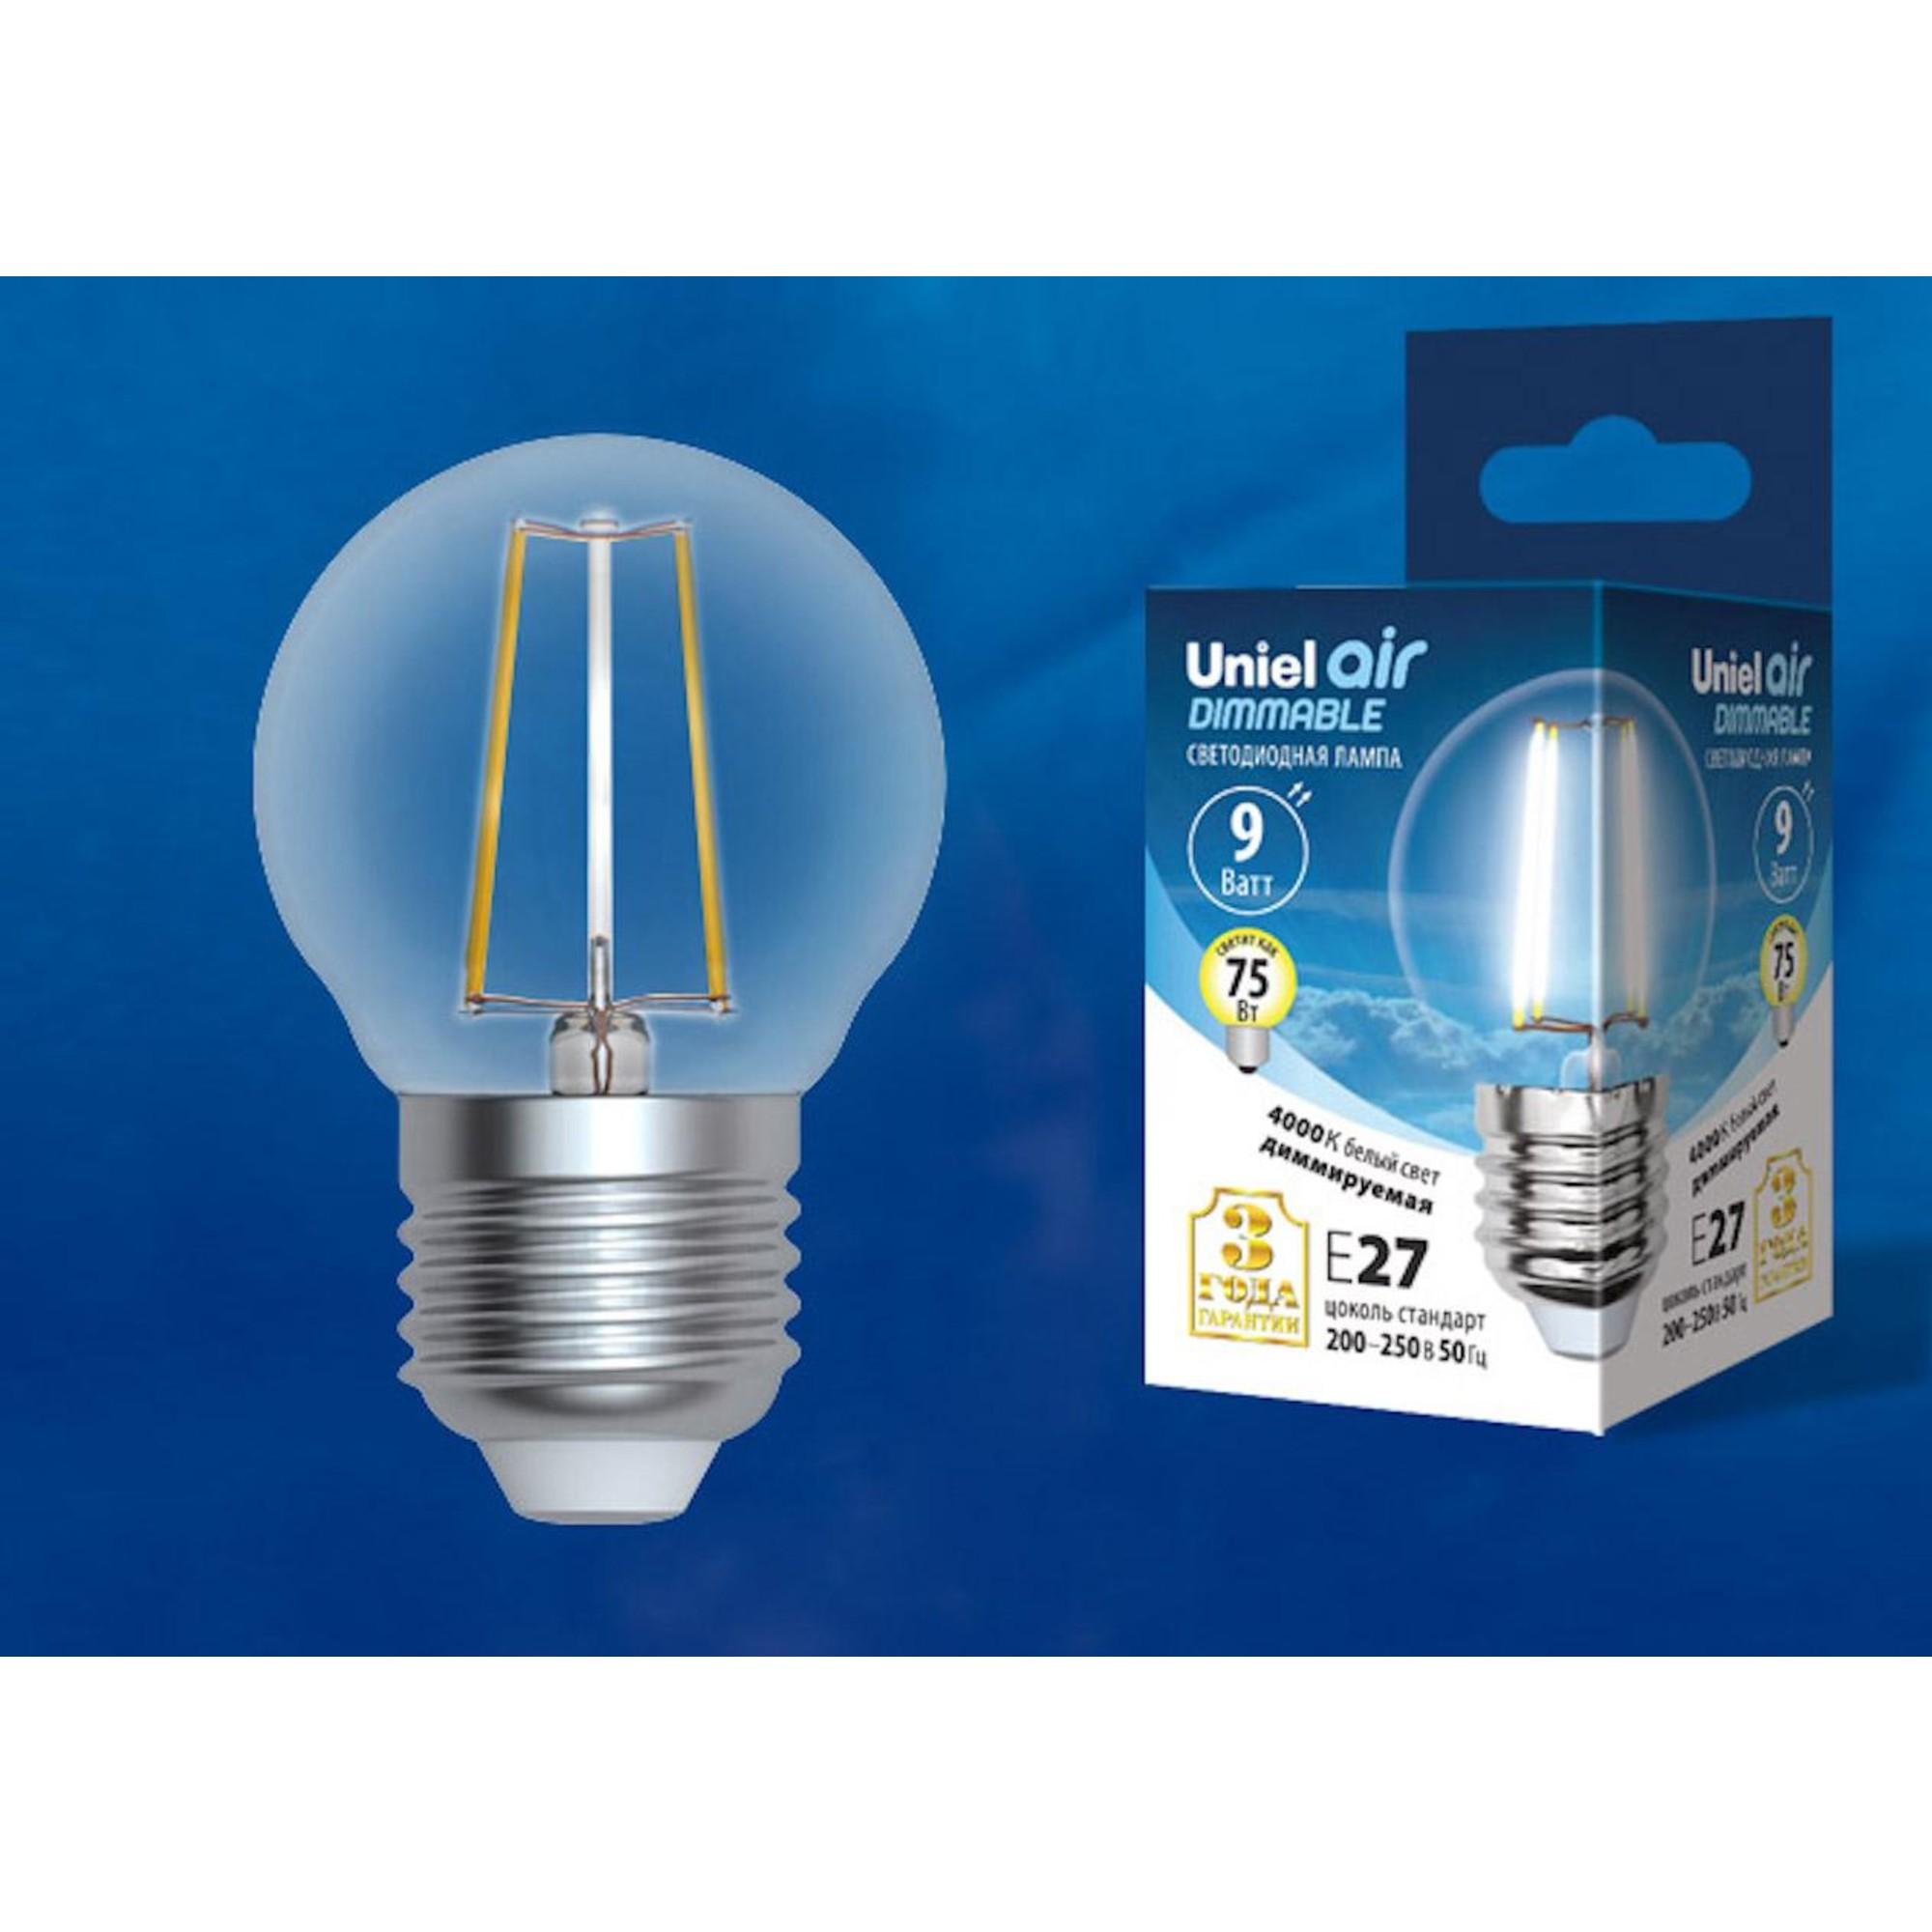 Светодиодная лампочка Uniel LED-G45-9W AIR DIMMABLE UL-00005194